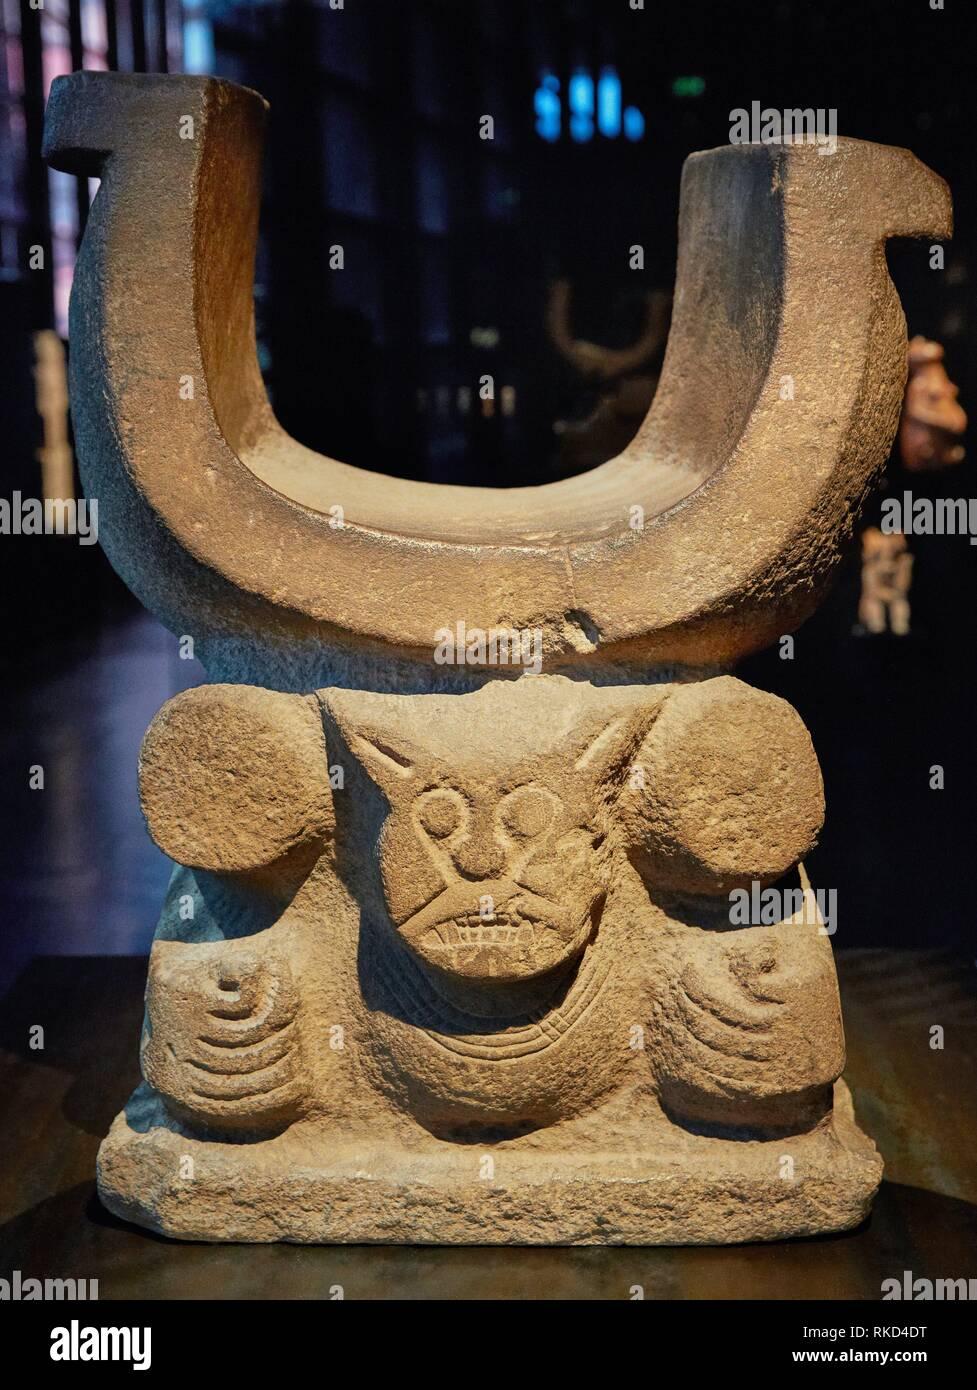 Banqueta chamánicos. Ecuador. Museo musée du Quai Branly, especializado en arte primitivo o tribal, el arquitecto Jean Nouvel. París. Francia Imagen De Stock